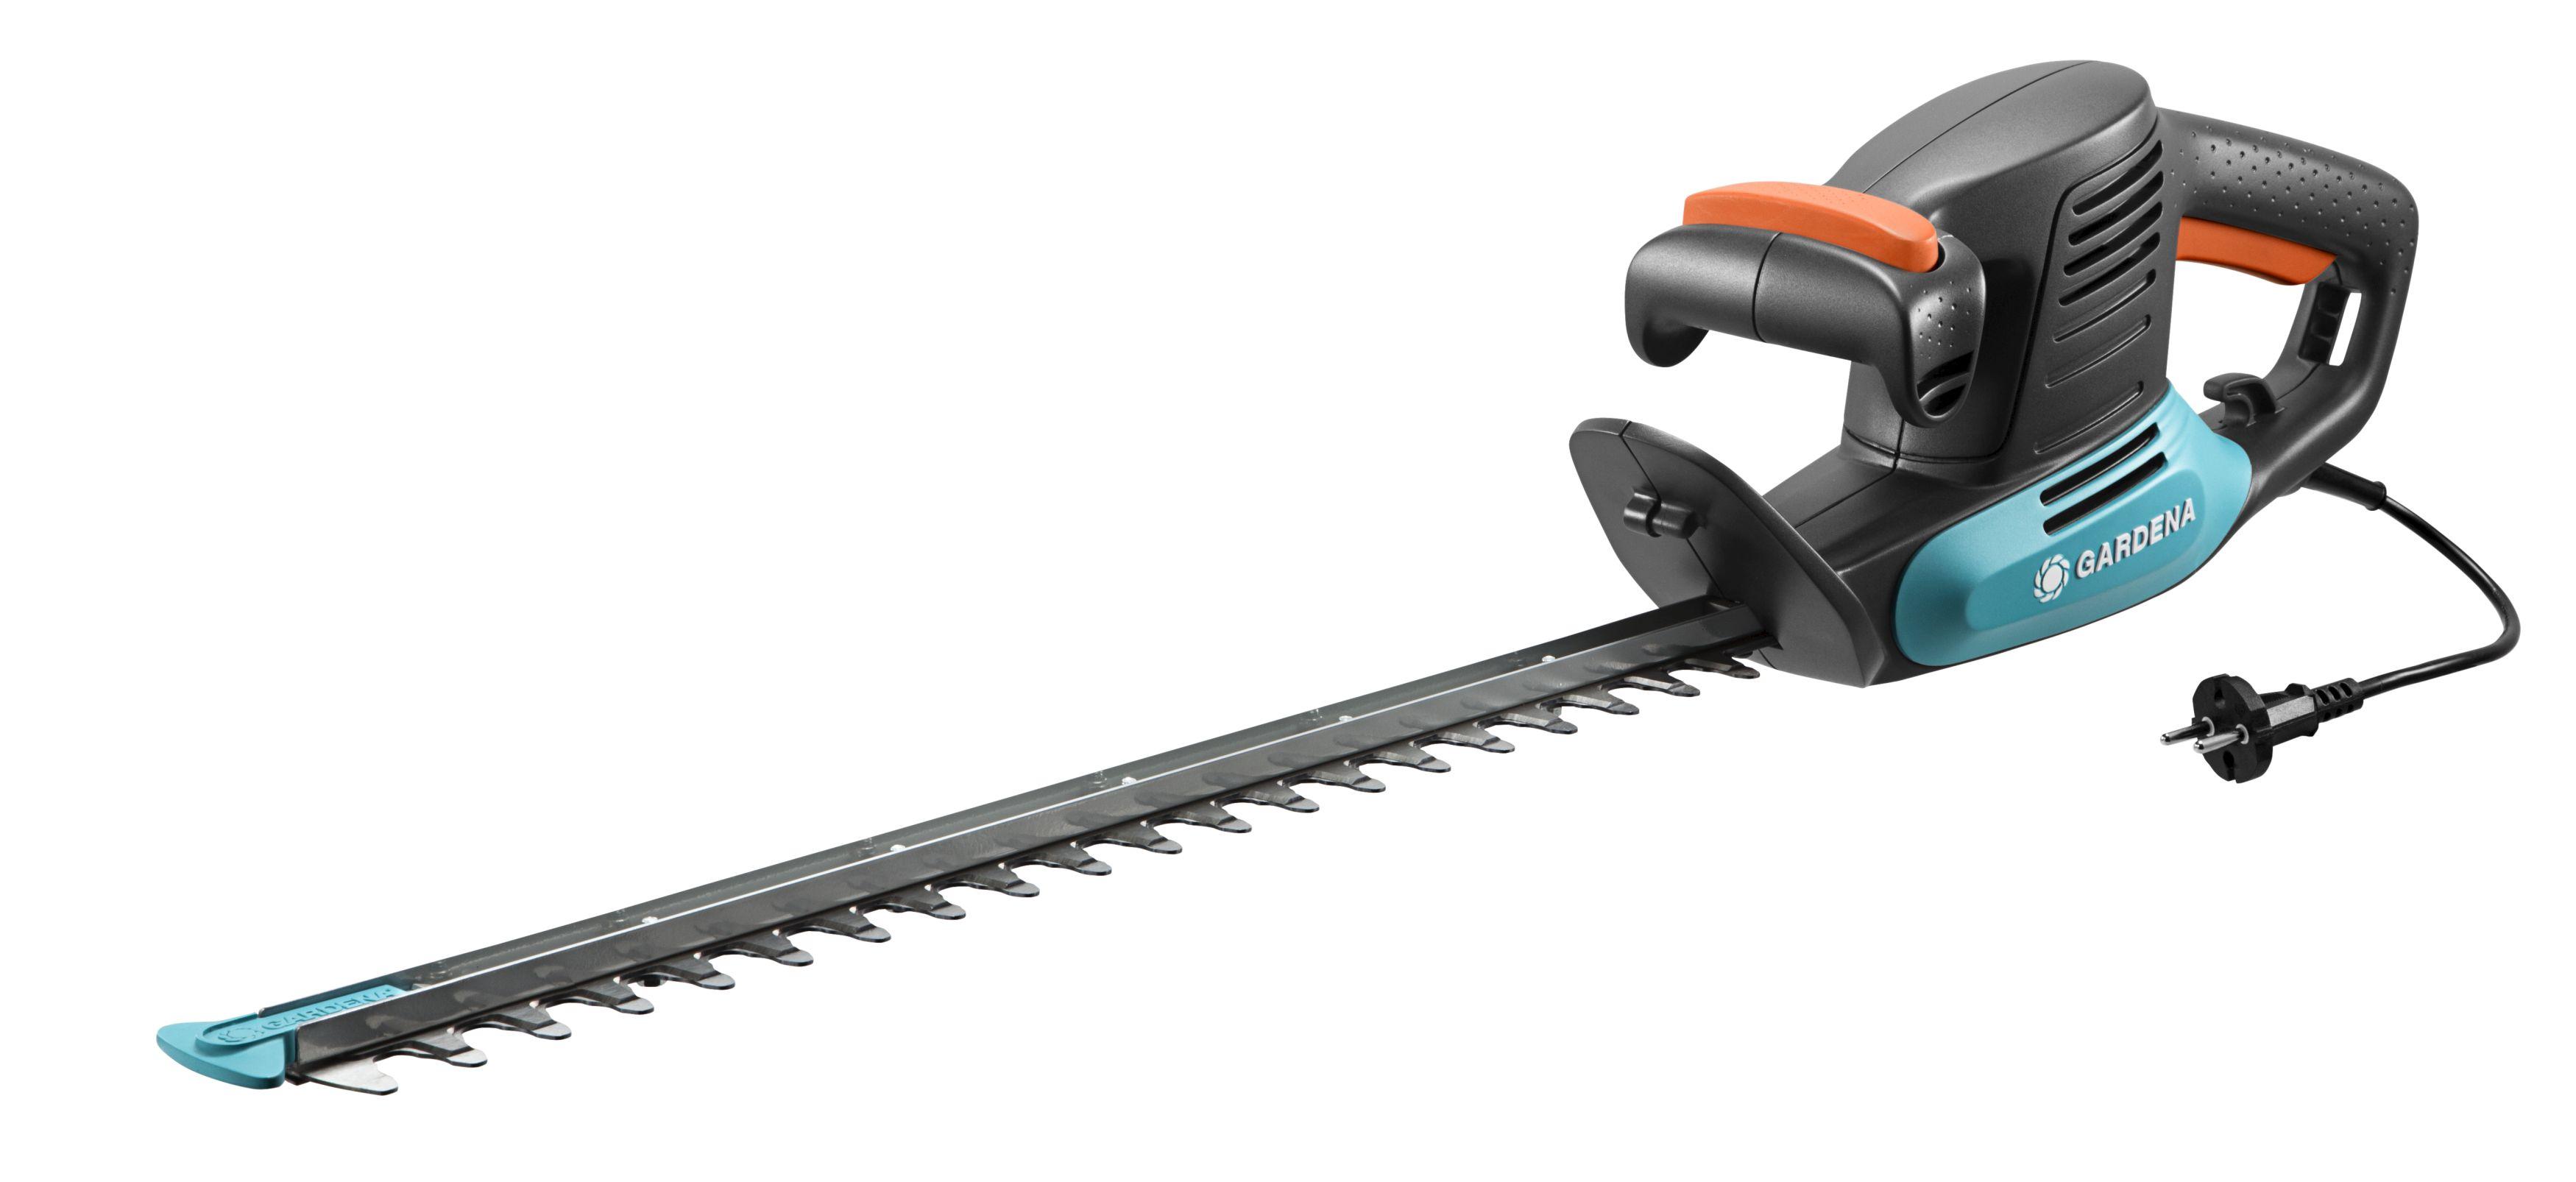 ������� Gardena Easycut 450/50